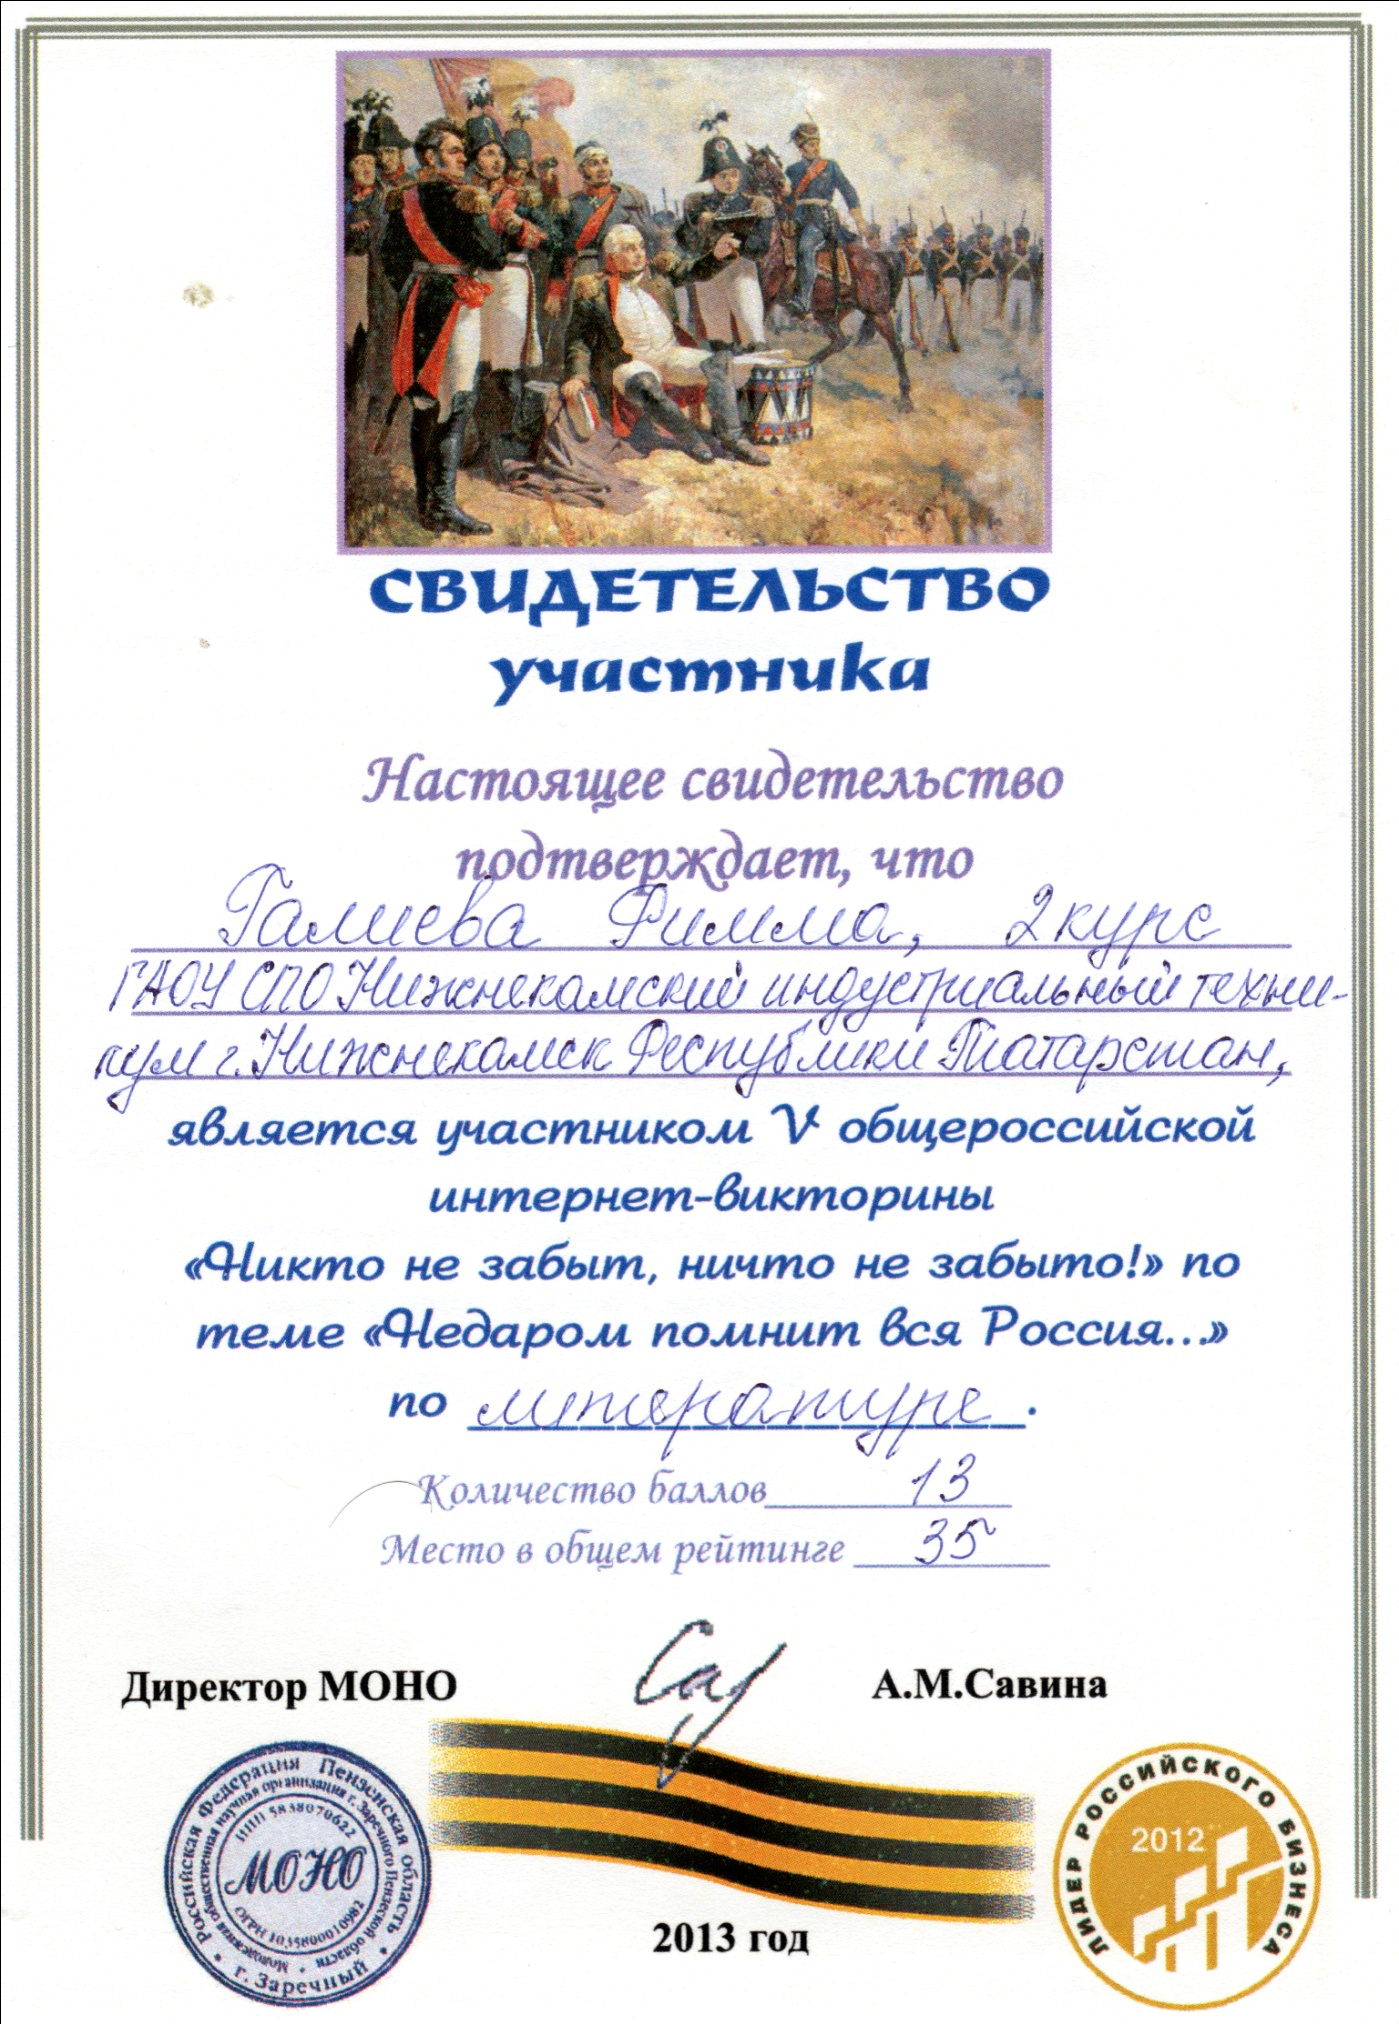 F:\Всероссйский конкурс Портфолио выпускника\РИММА\img988.jpg